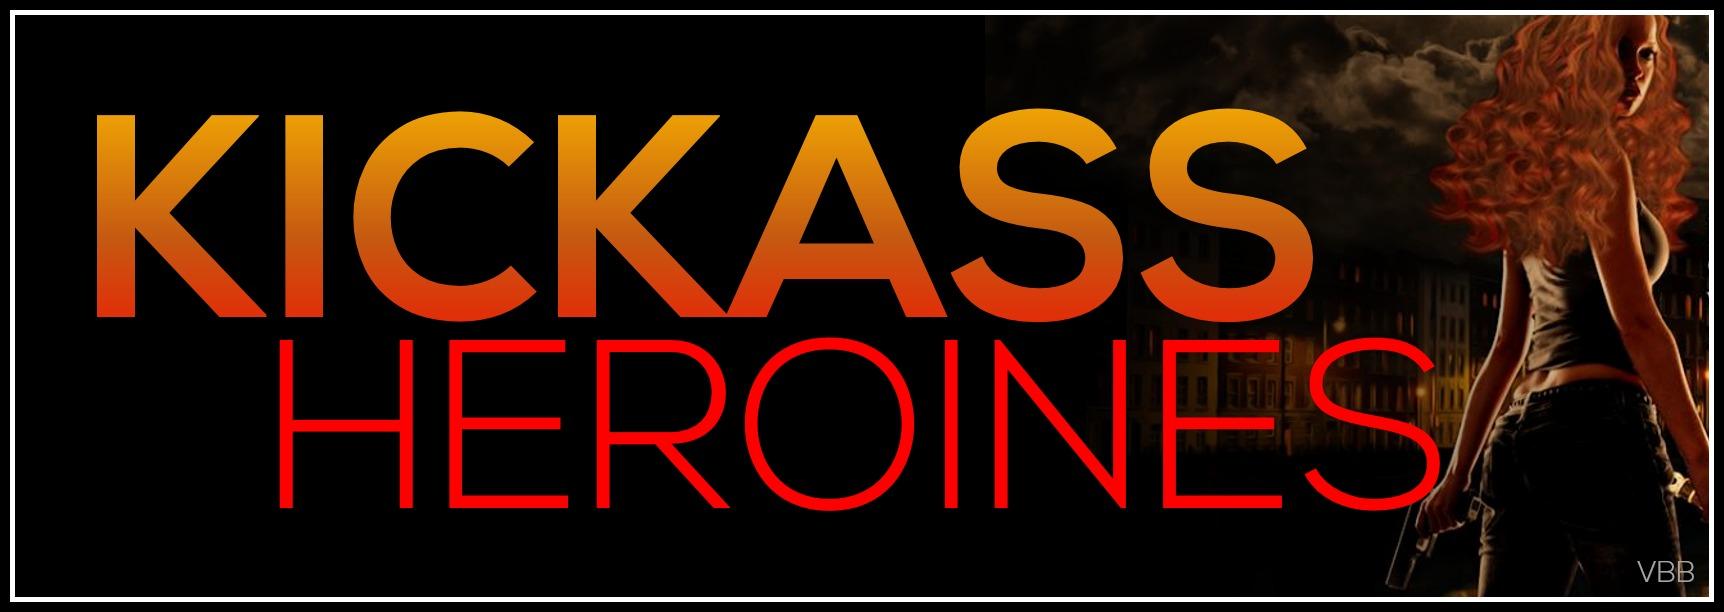 Kickass Heroine